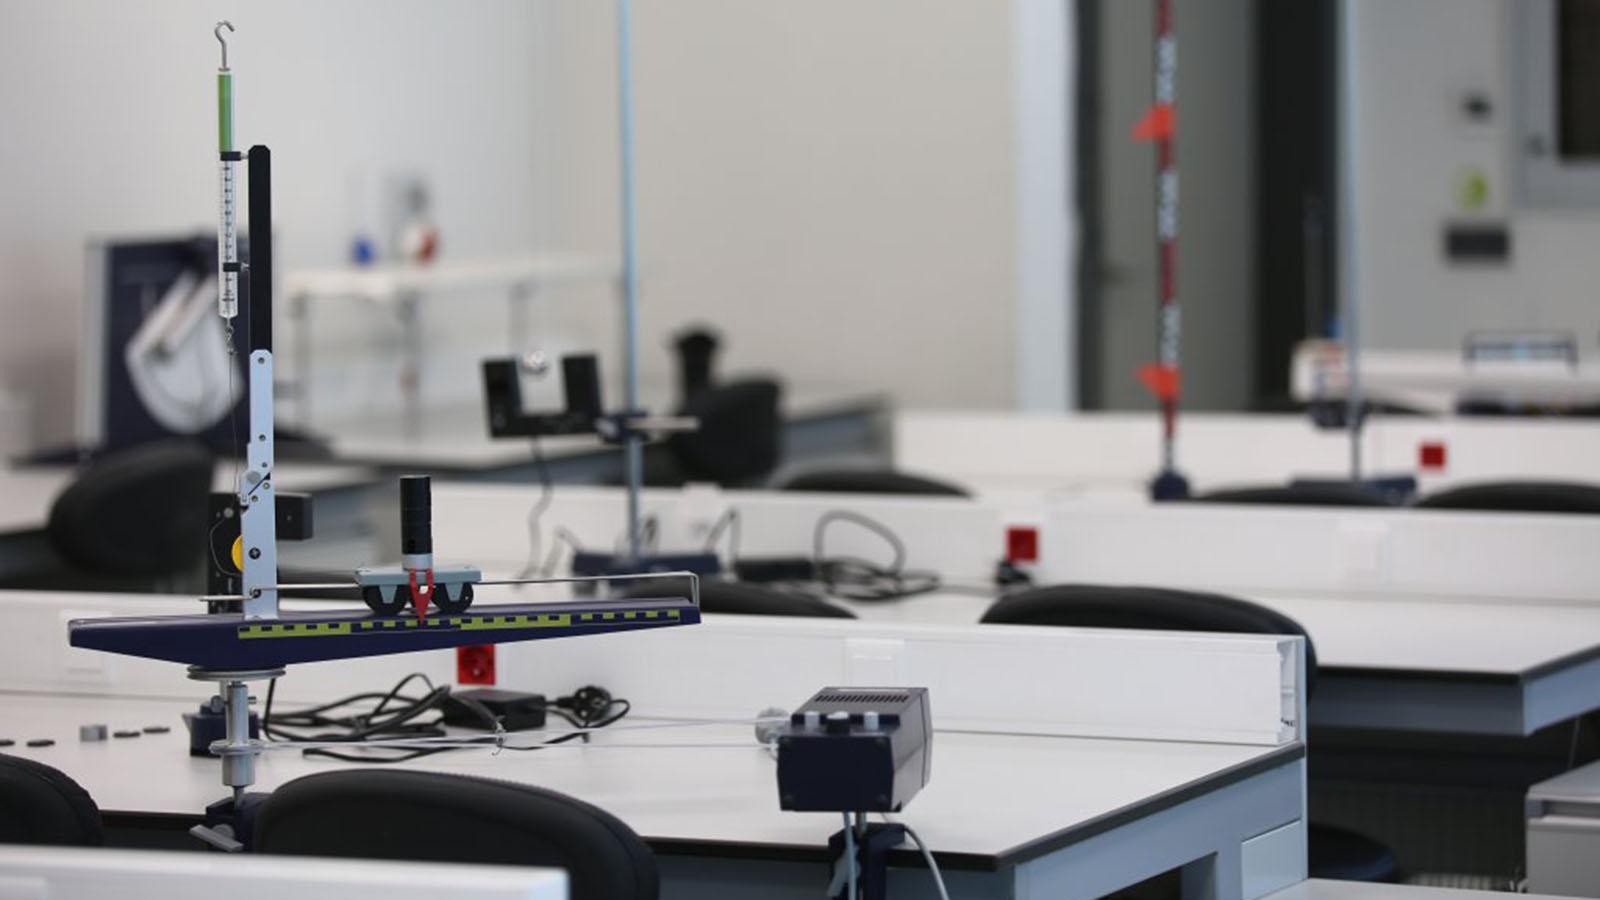 Hμερίδα:FRONTIERS:Φέρνοντας την έρευνα αιχμής στη Φυσική στην Σχολική Τάξη